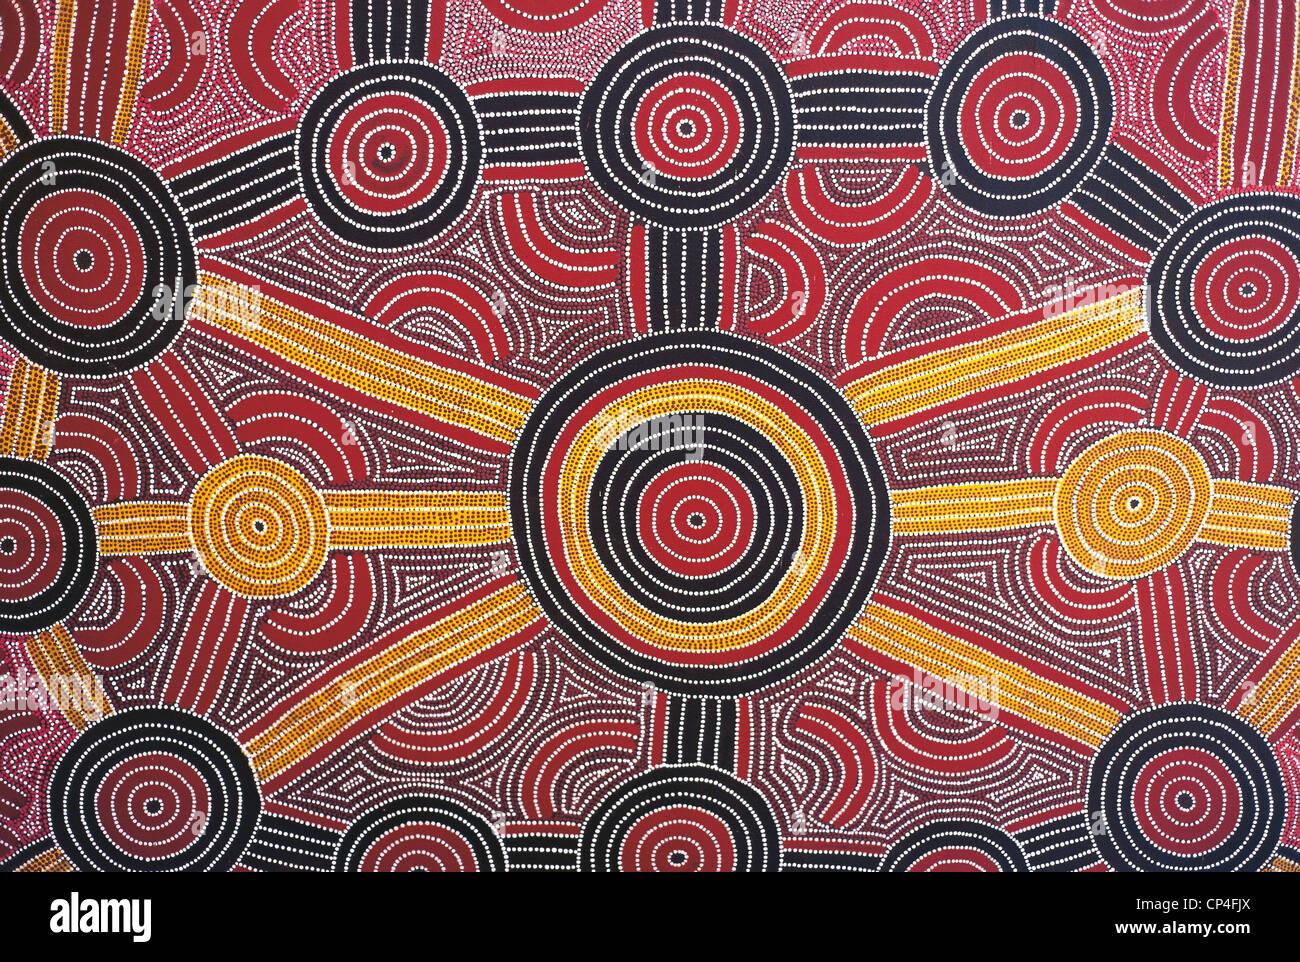 Australien - Uluru-Kata Tjuta National Park. Aborigines Malerei im Sheraton Hotel. Stockfoto